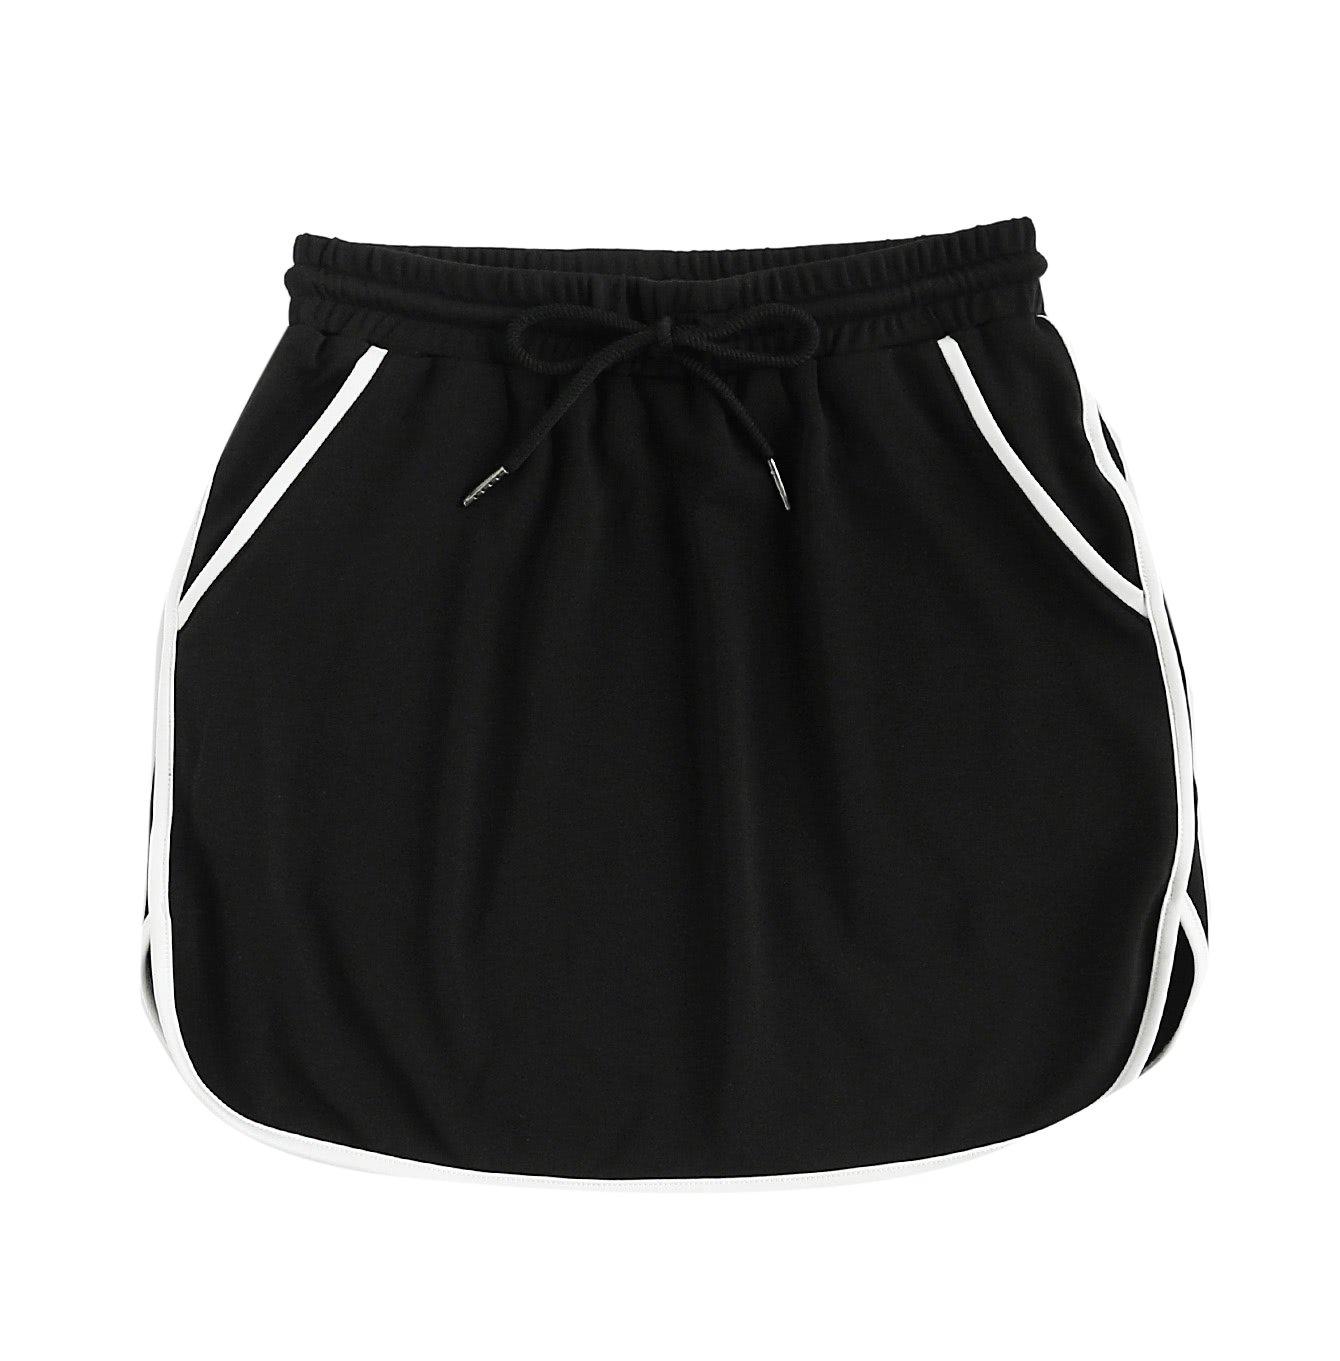 SweatyRocks Women's Summer Athletic Skirt with Drawstring Waist and Pockets Black S